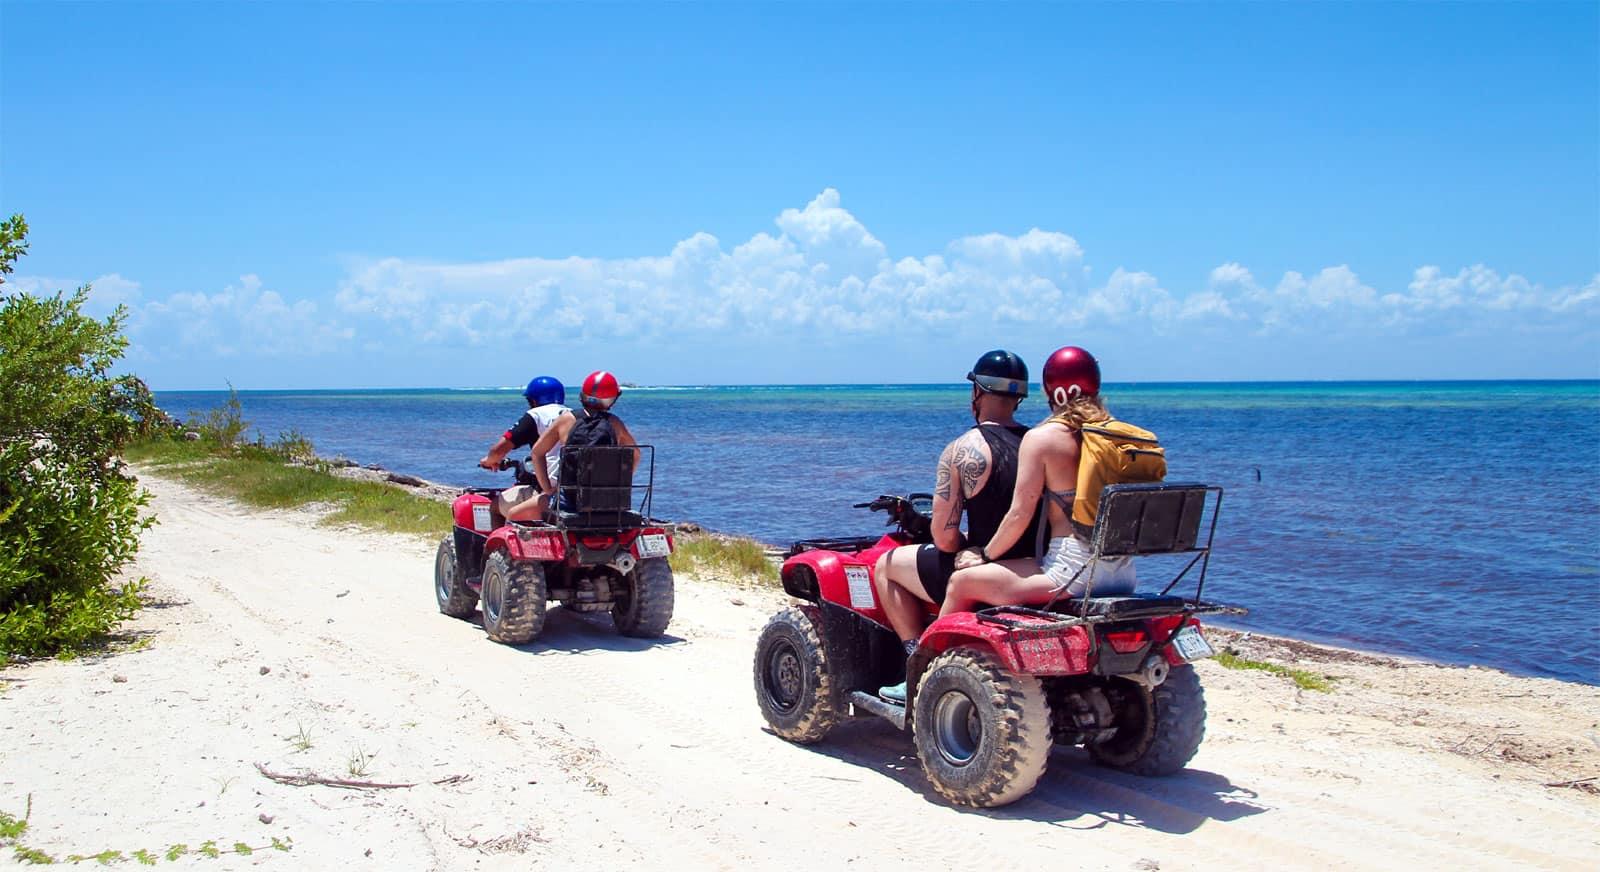 Cozumel Island Tour Atv Mai Cozumel Cruise Excursions